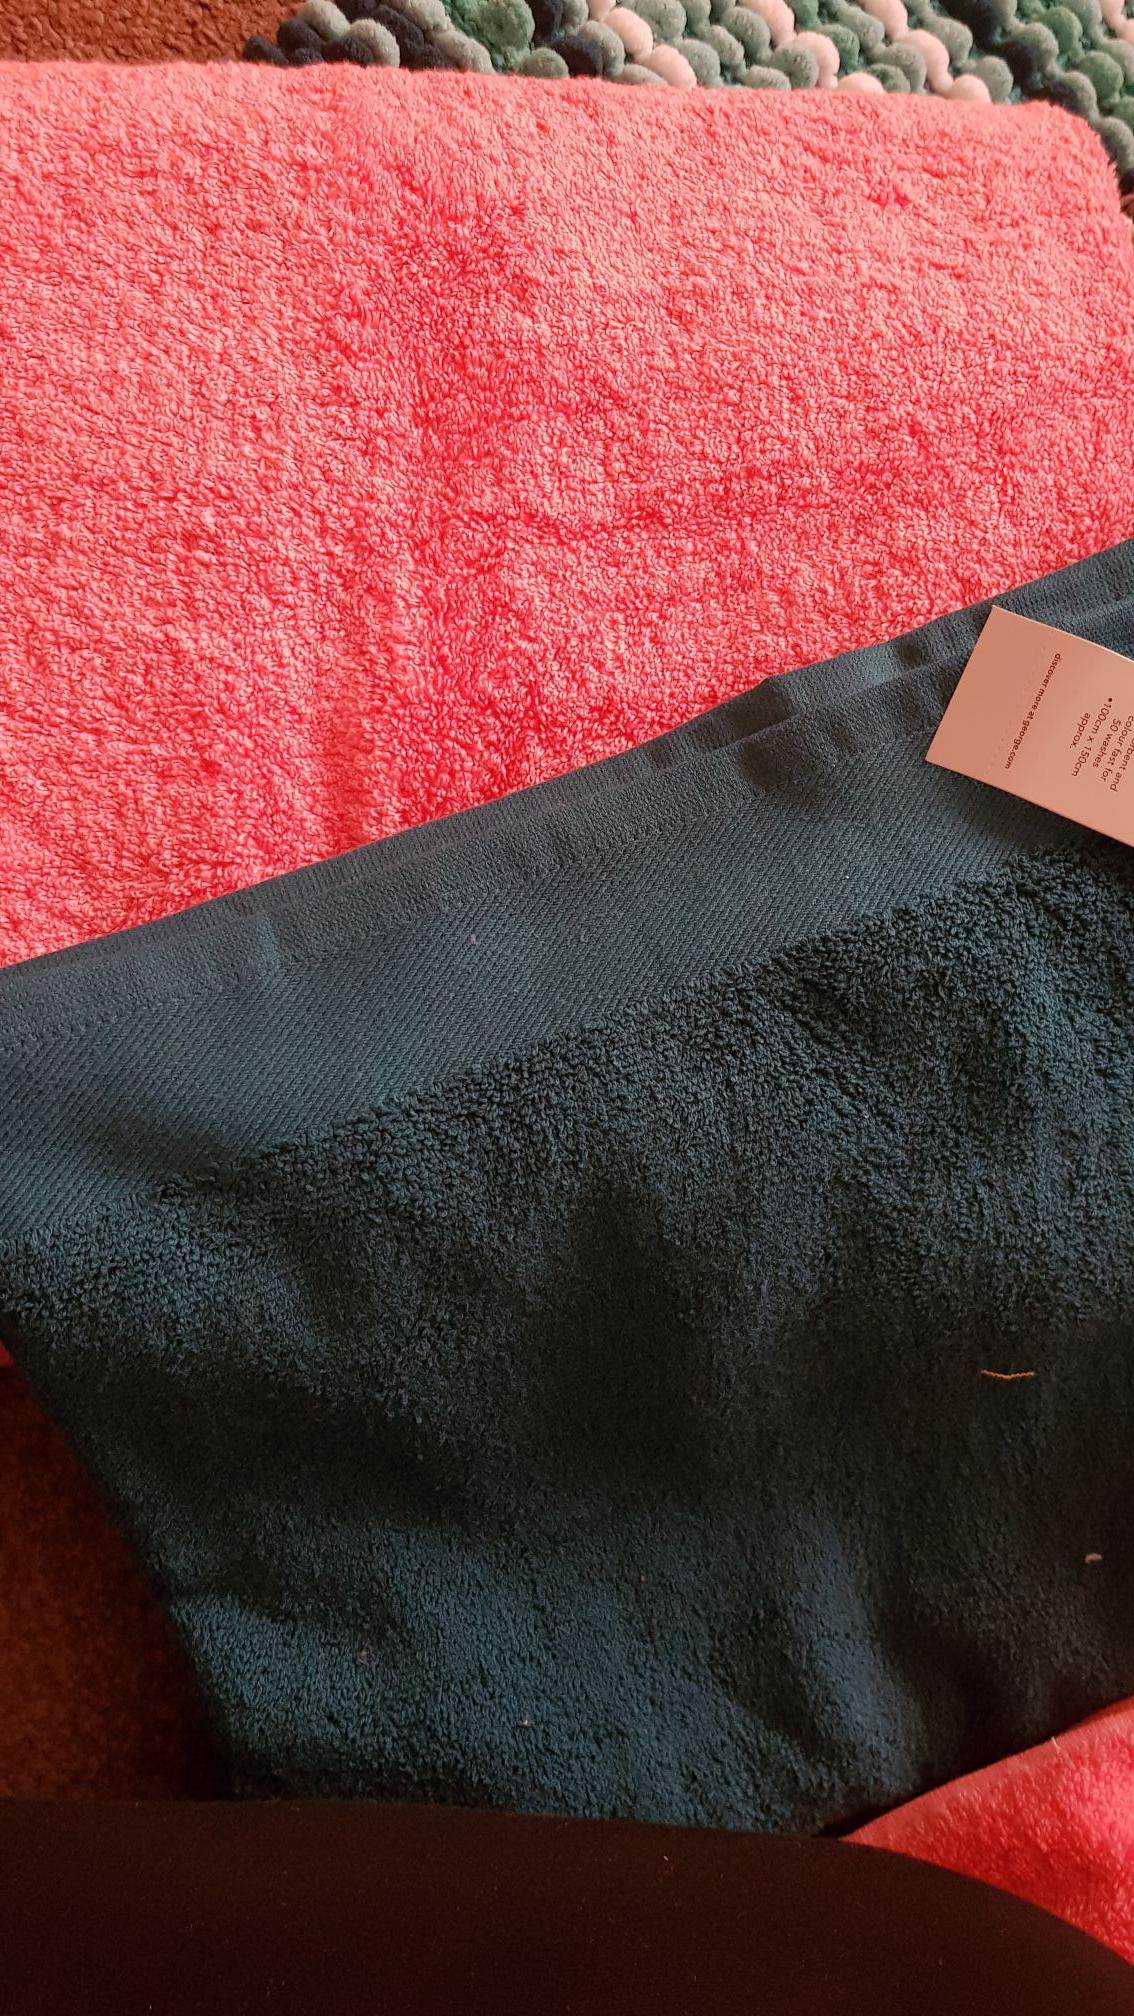 Bath sheets , shower curtains 75p @ Asda instore